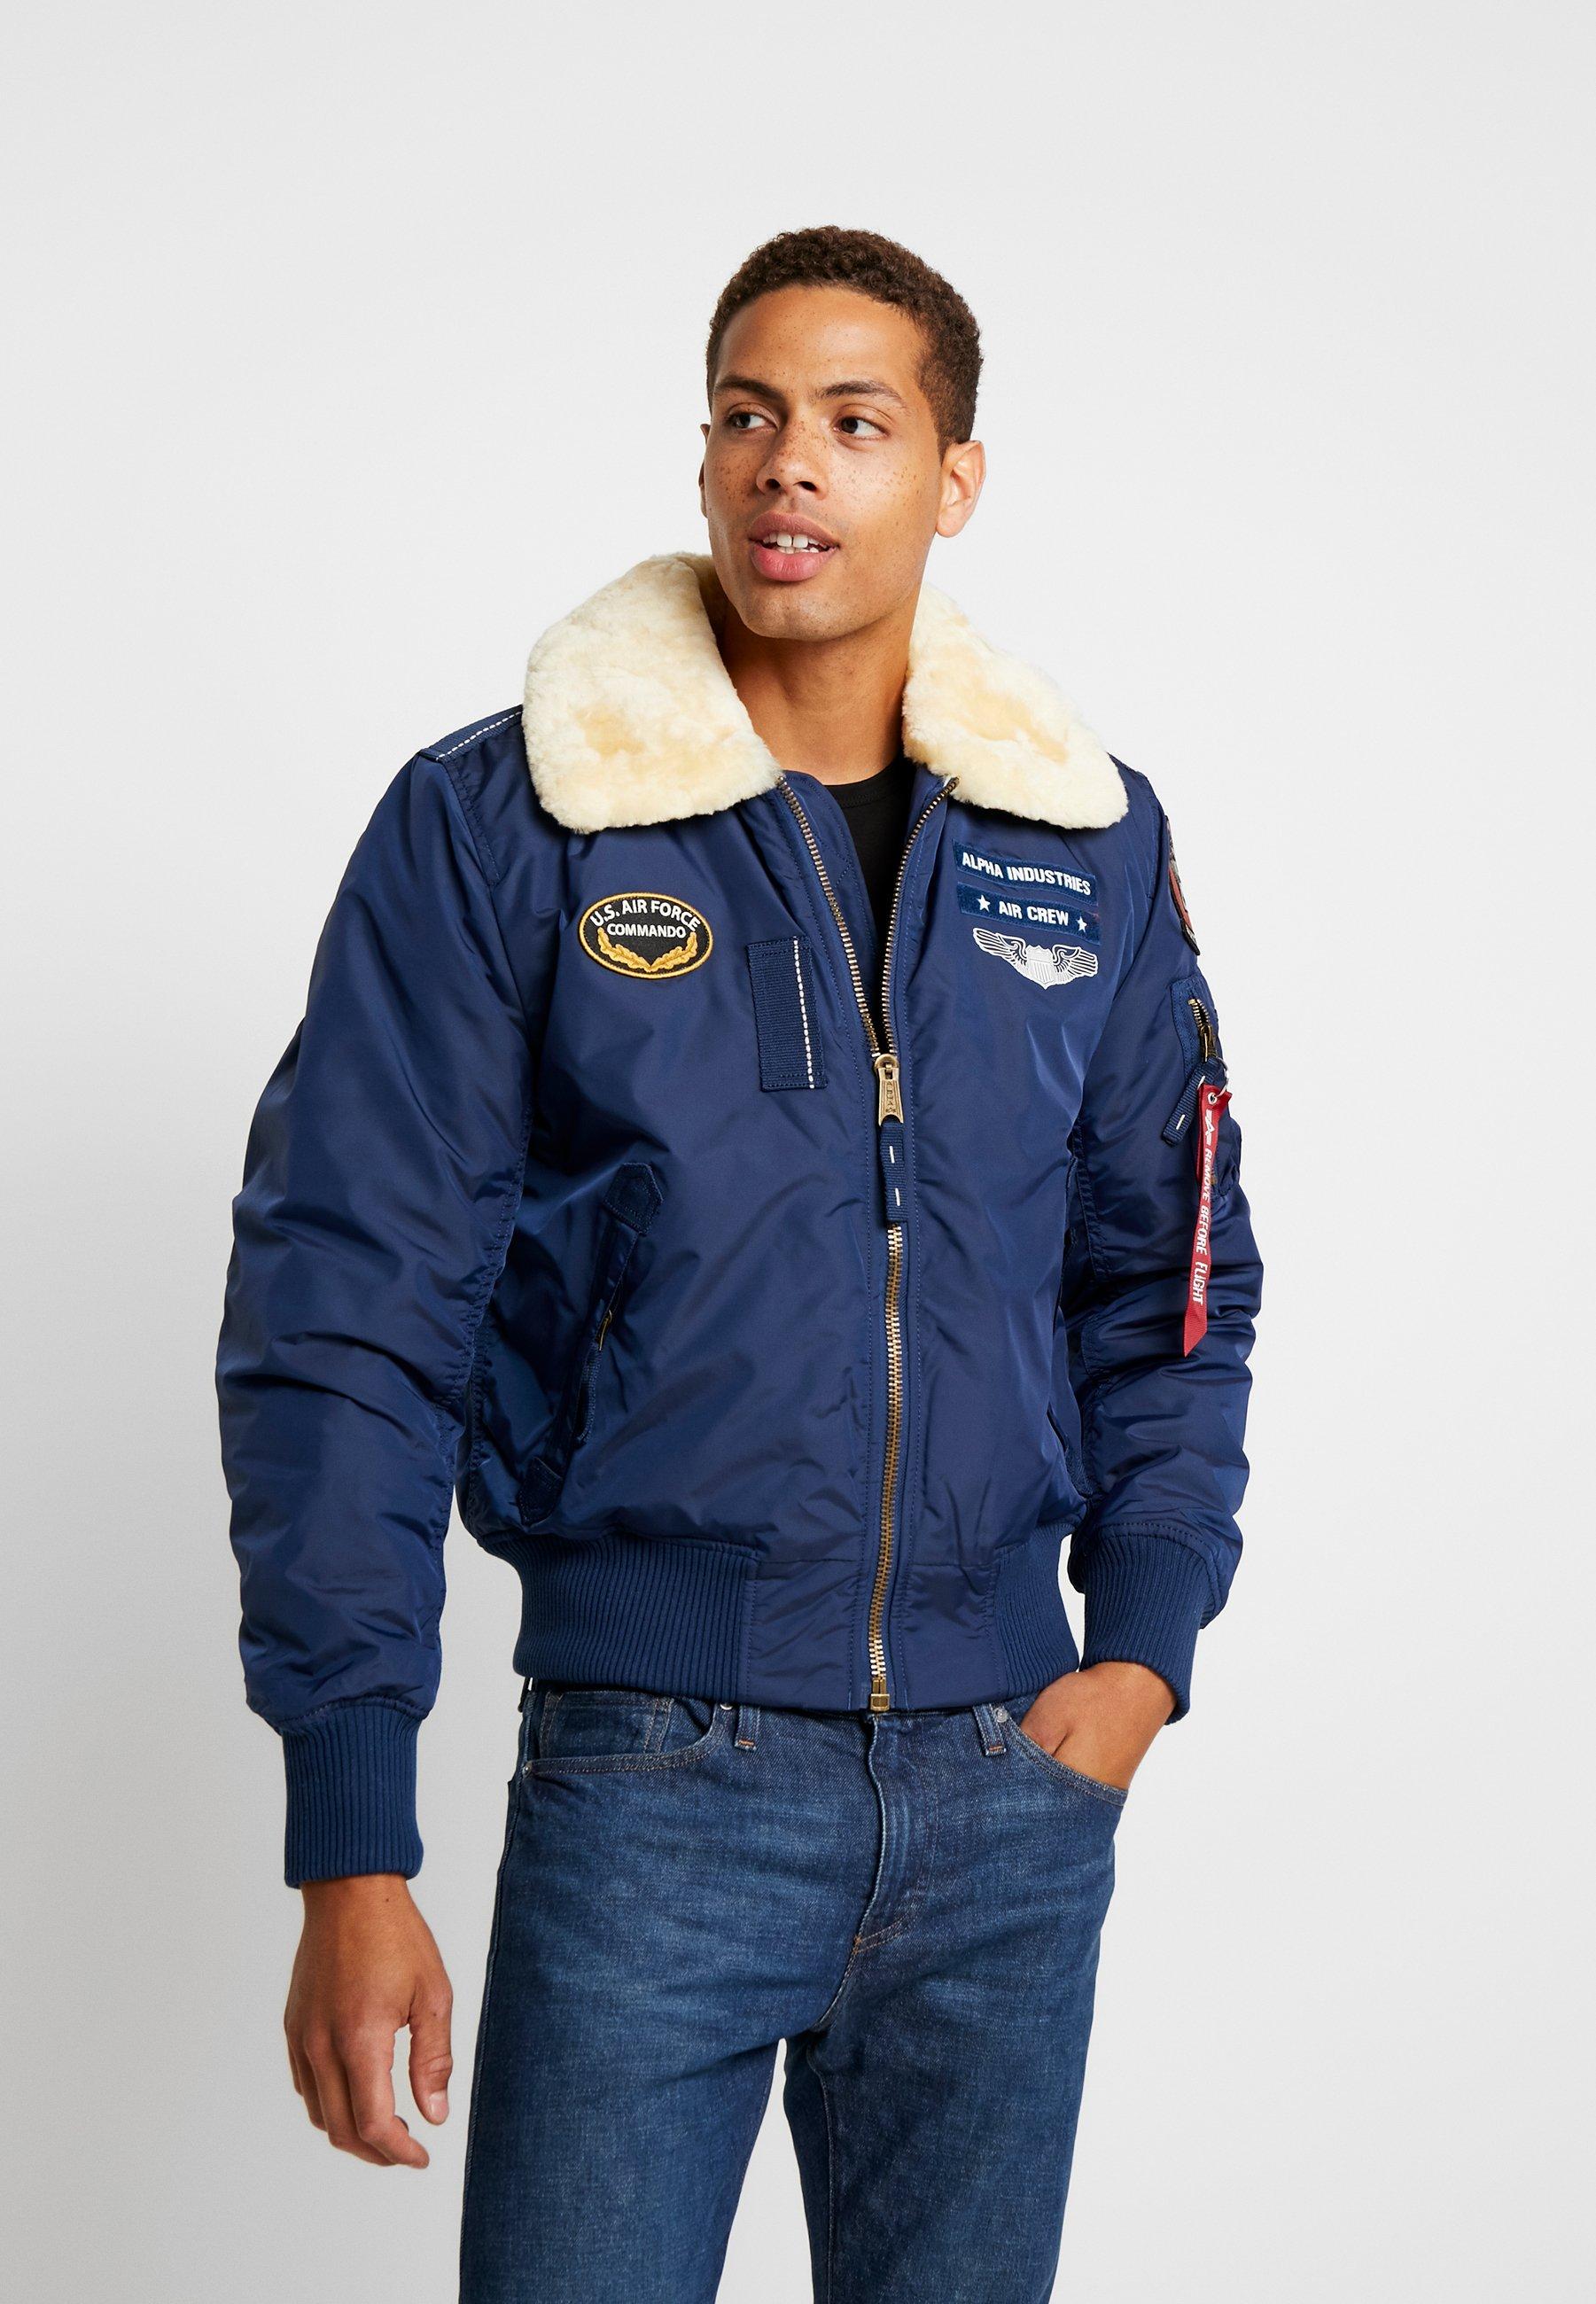 Homme INJECTOR AIR FORCE - Veste d'hiver